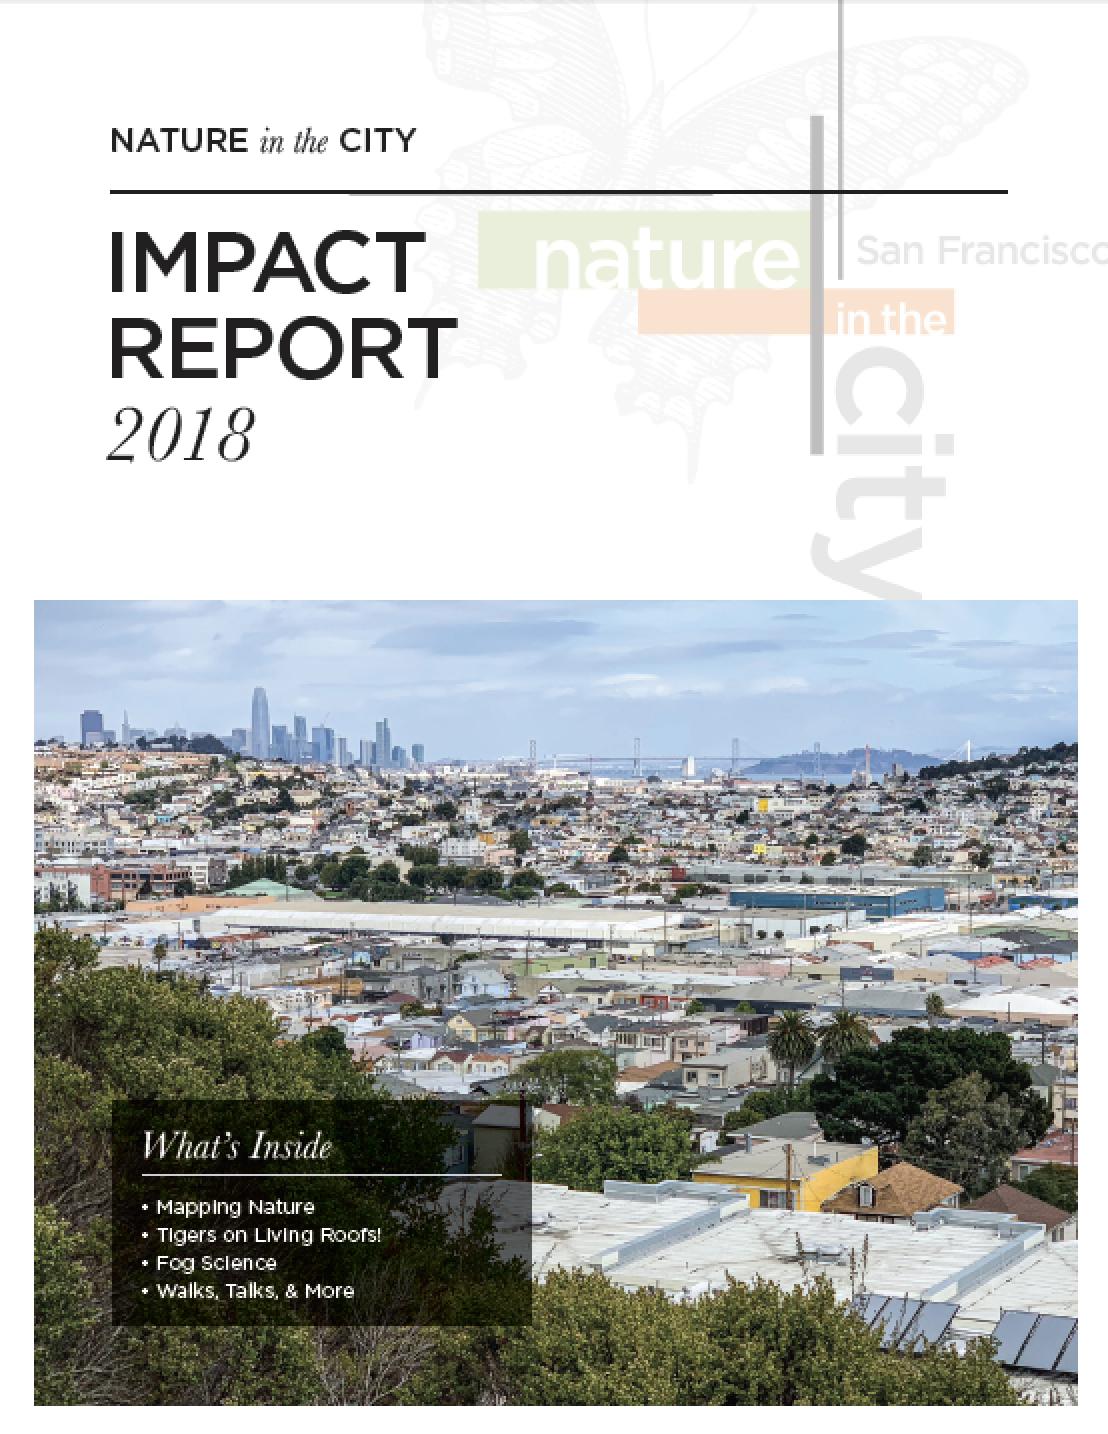 NTC 2018 Impact Report